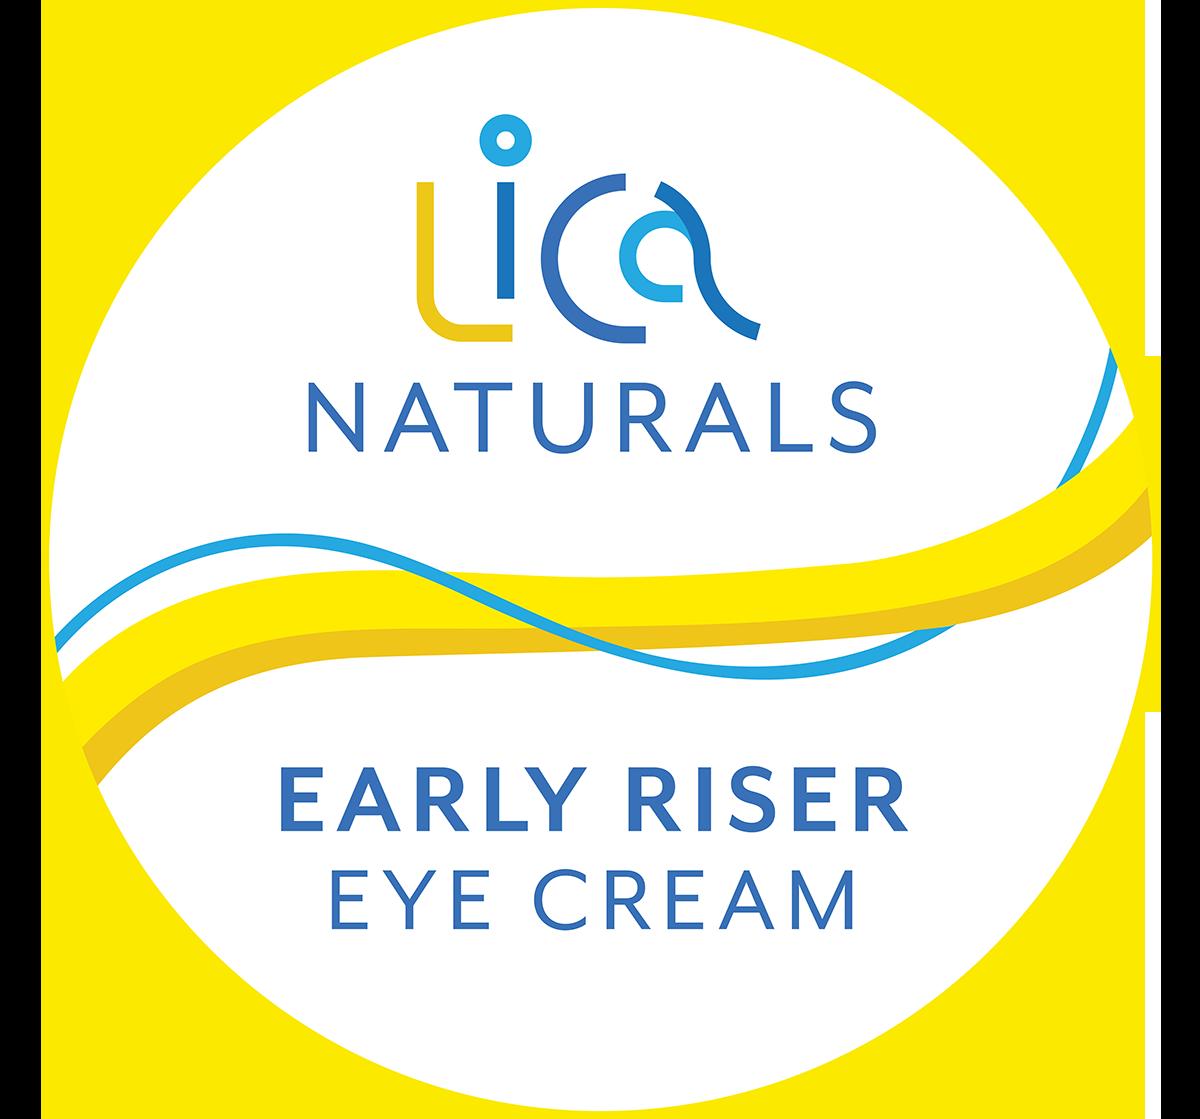 Early Riser >> Early Riser Eye Cream Lica Naturals